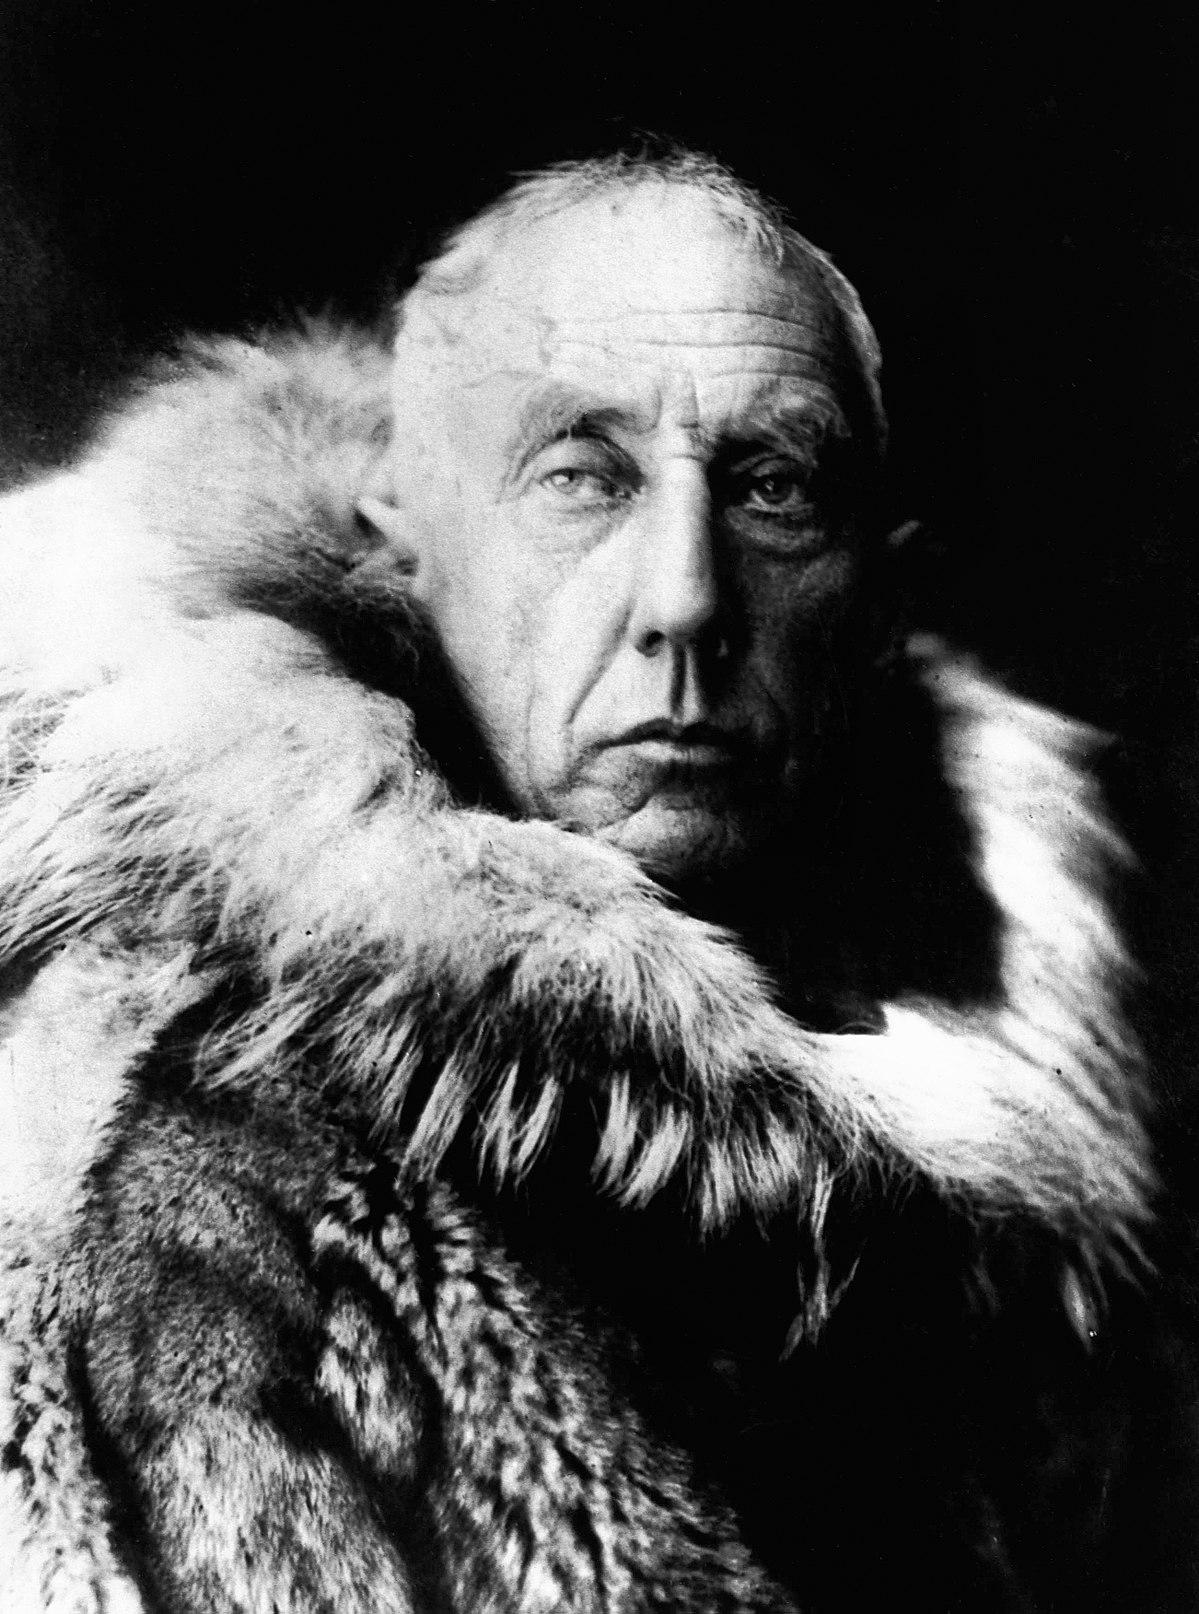 1200px-Amundsen_in_fur_skins